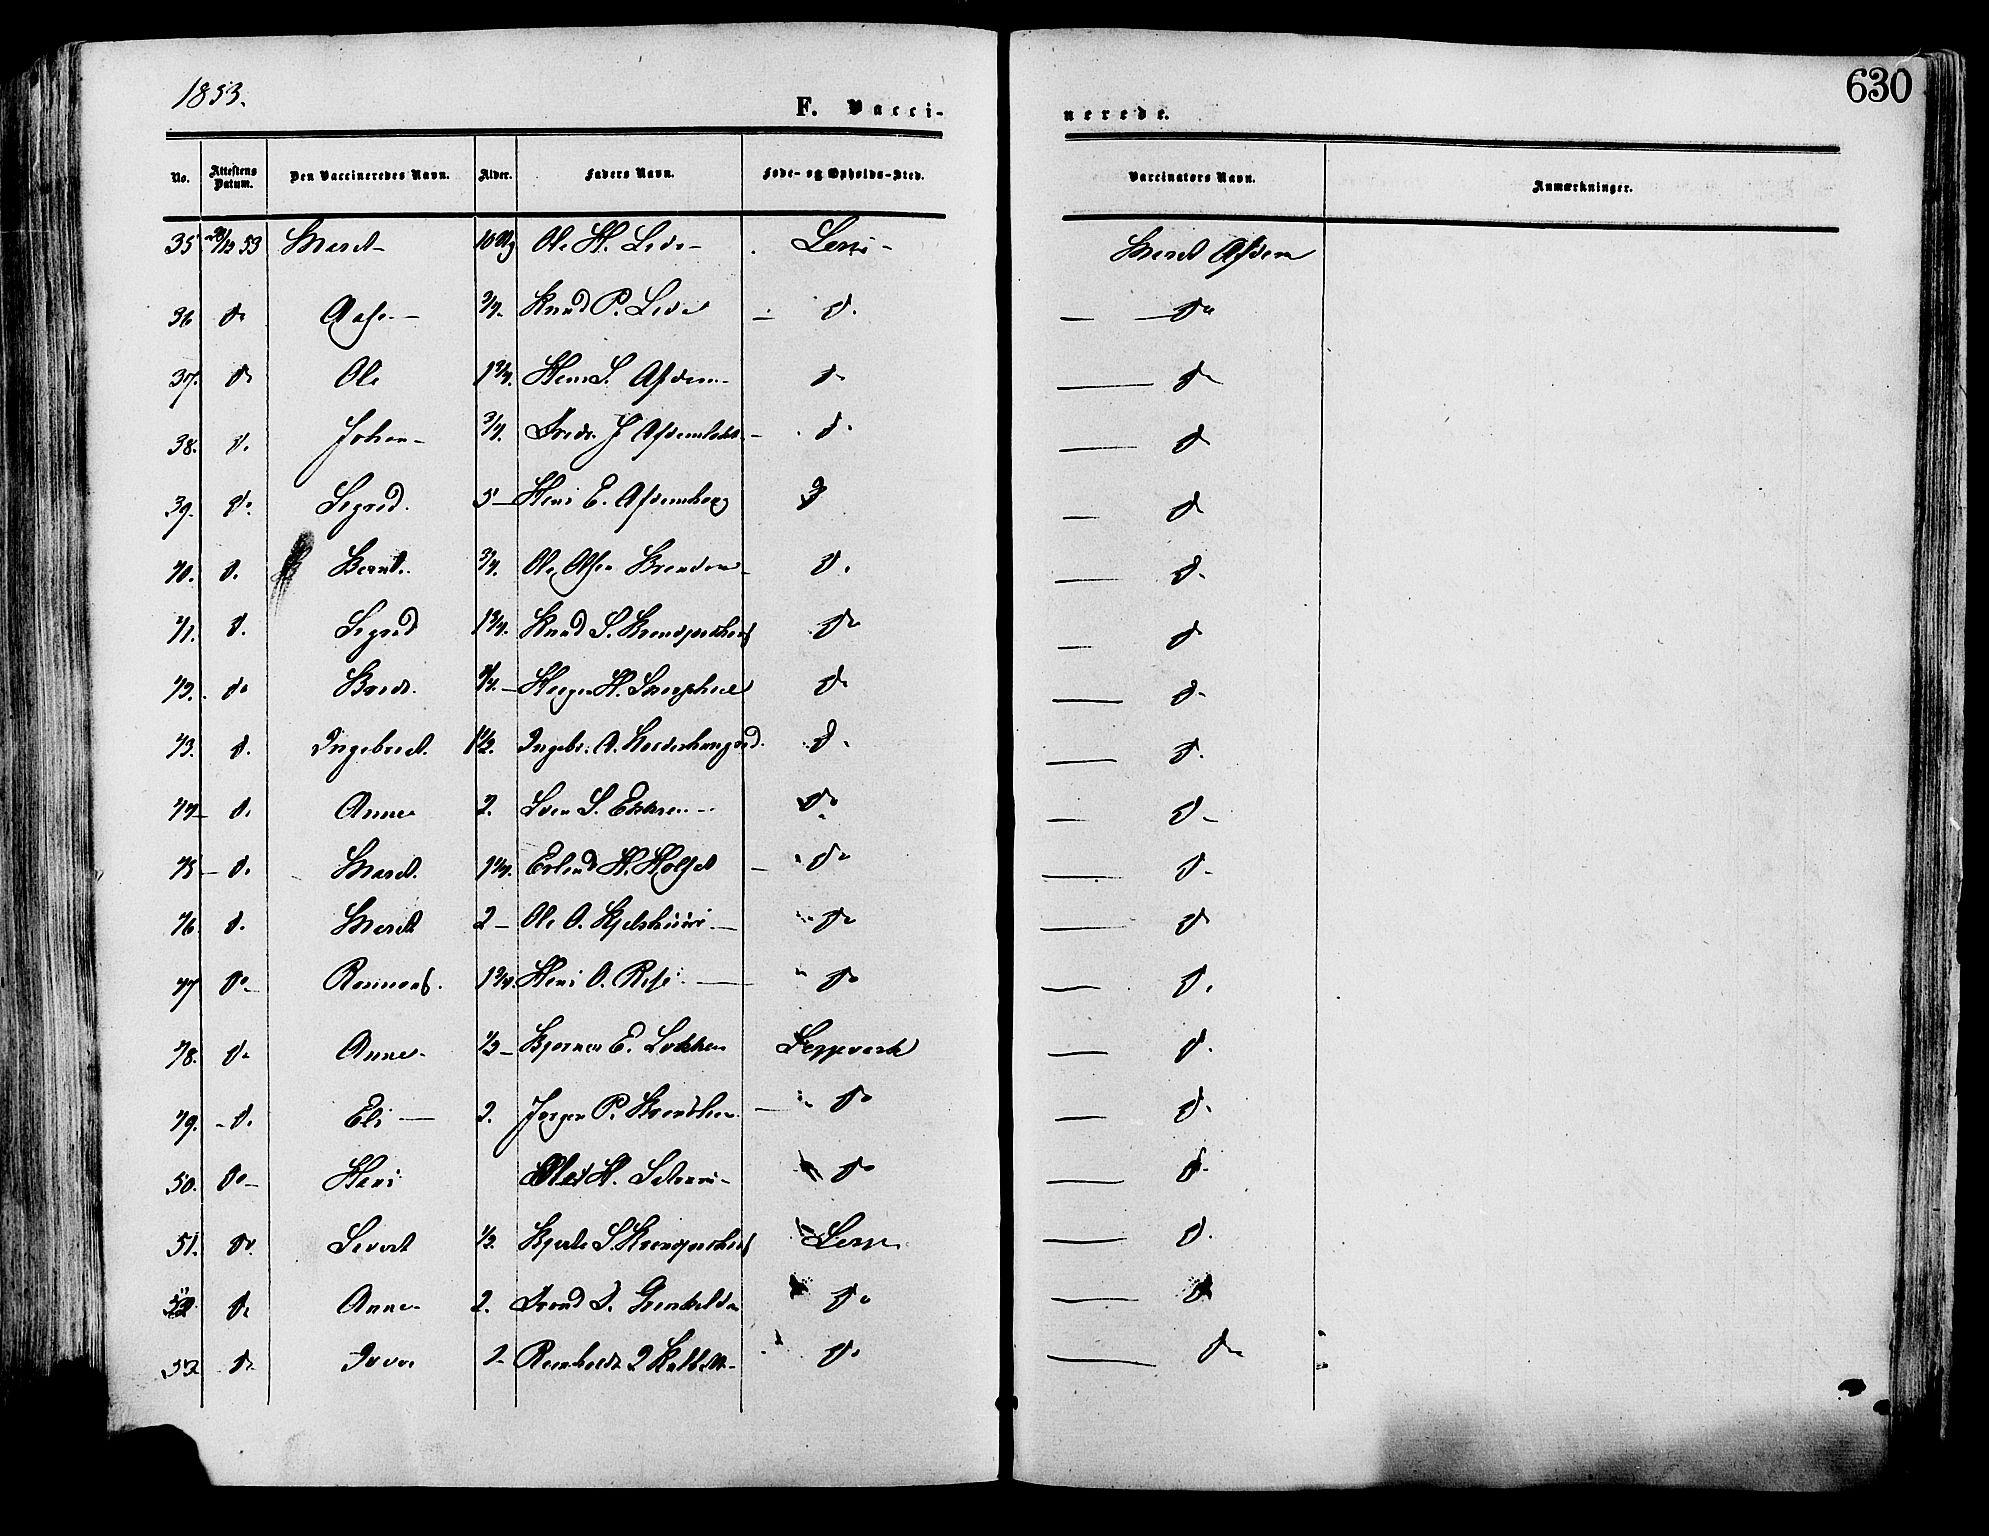 SAH, Lesja prestekontor, Ministerialbok nr. 8, 1854-1880, s. 630